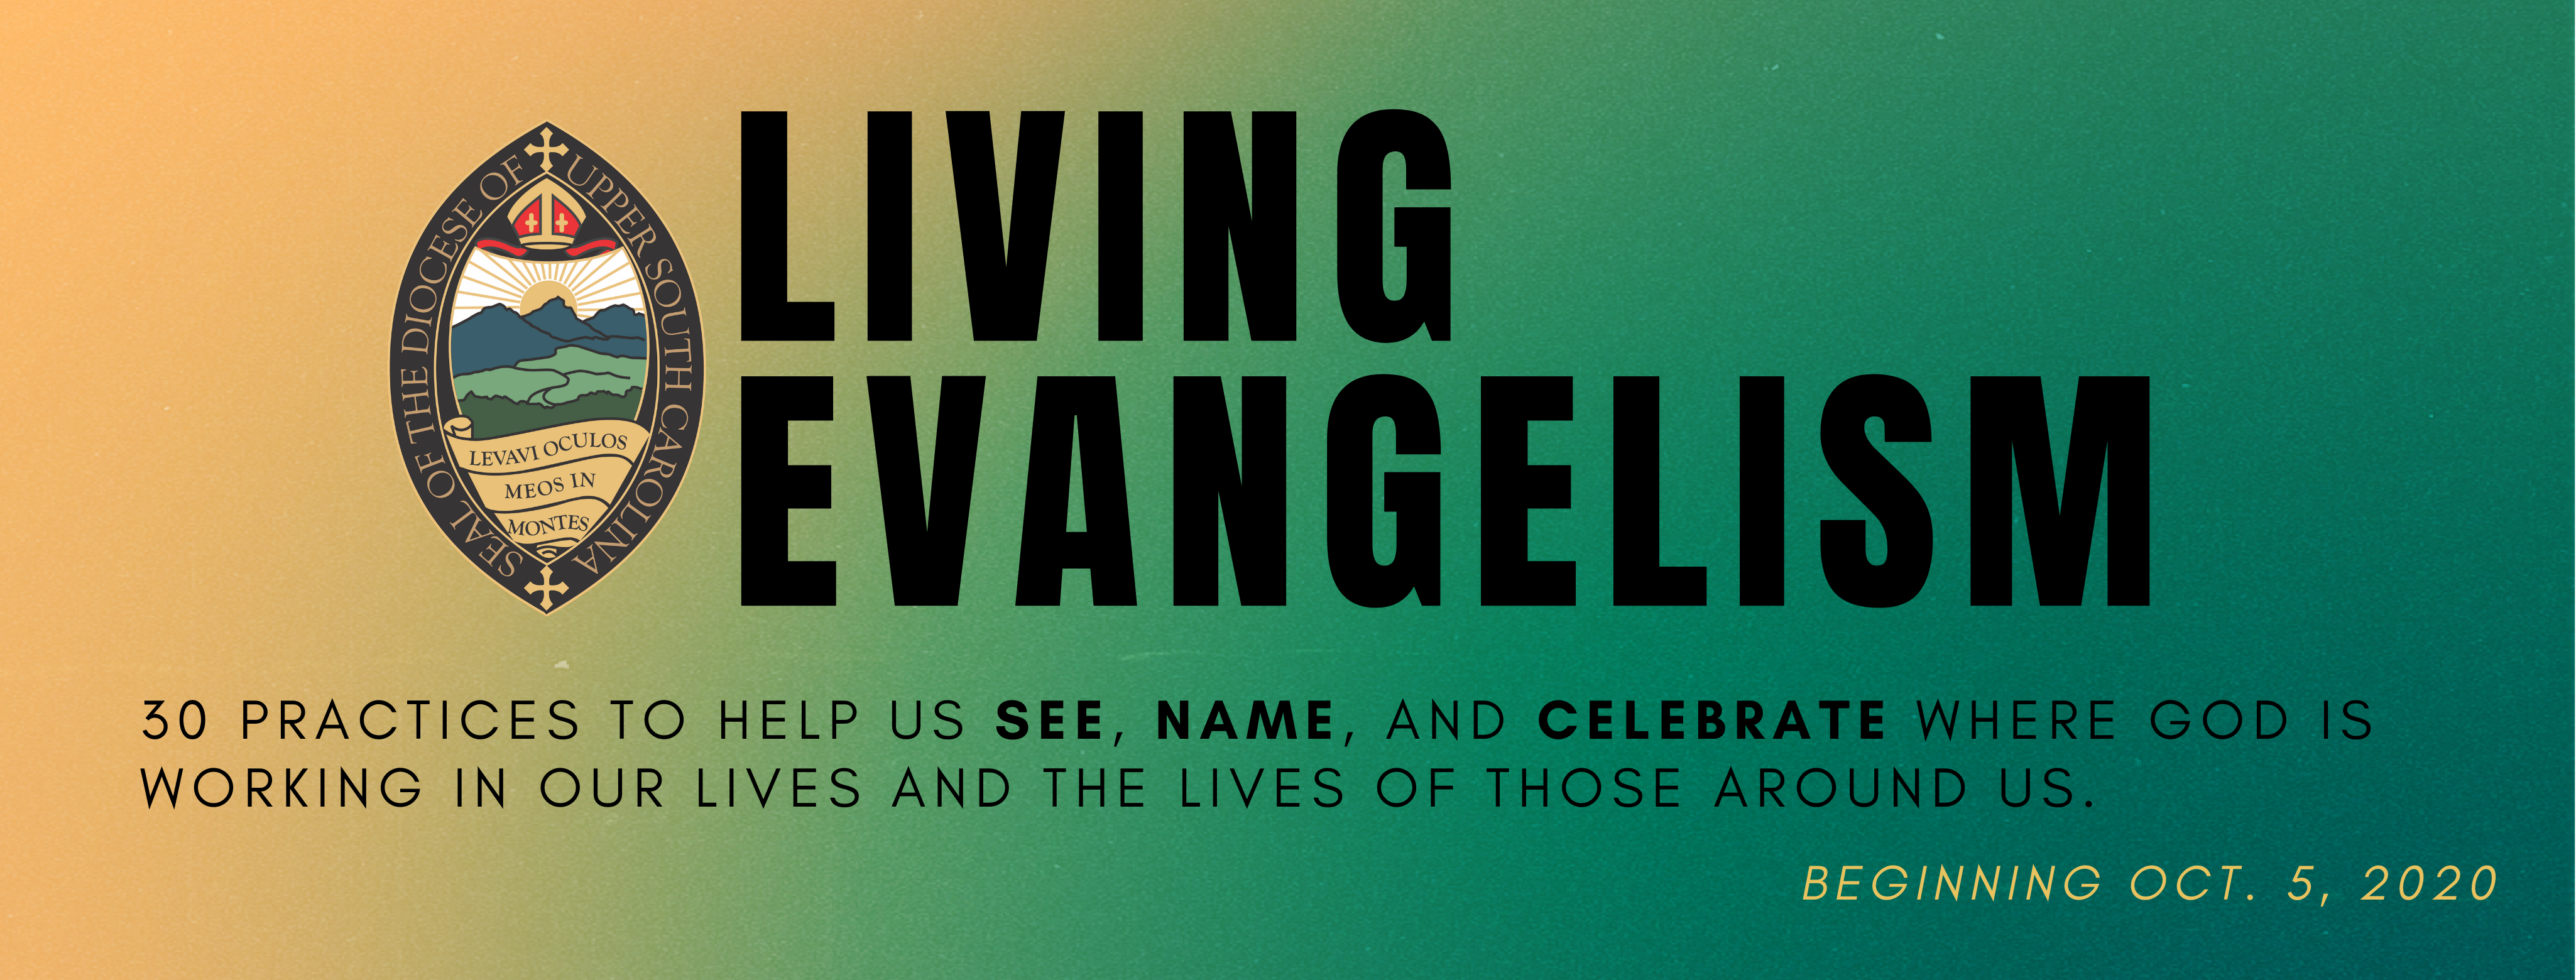 copy-of-living-evangelism_962